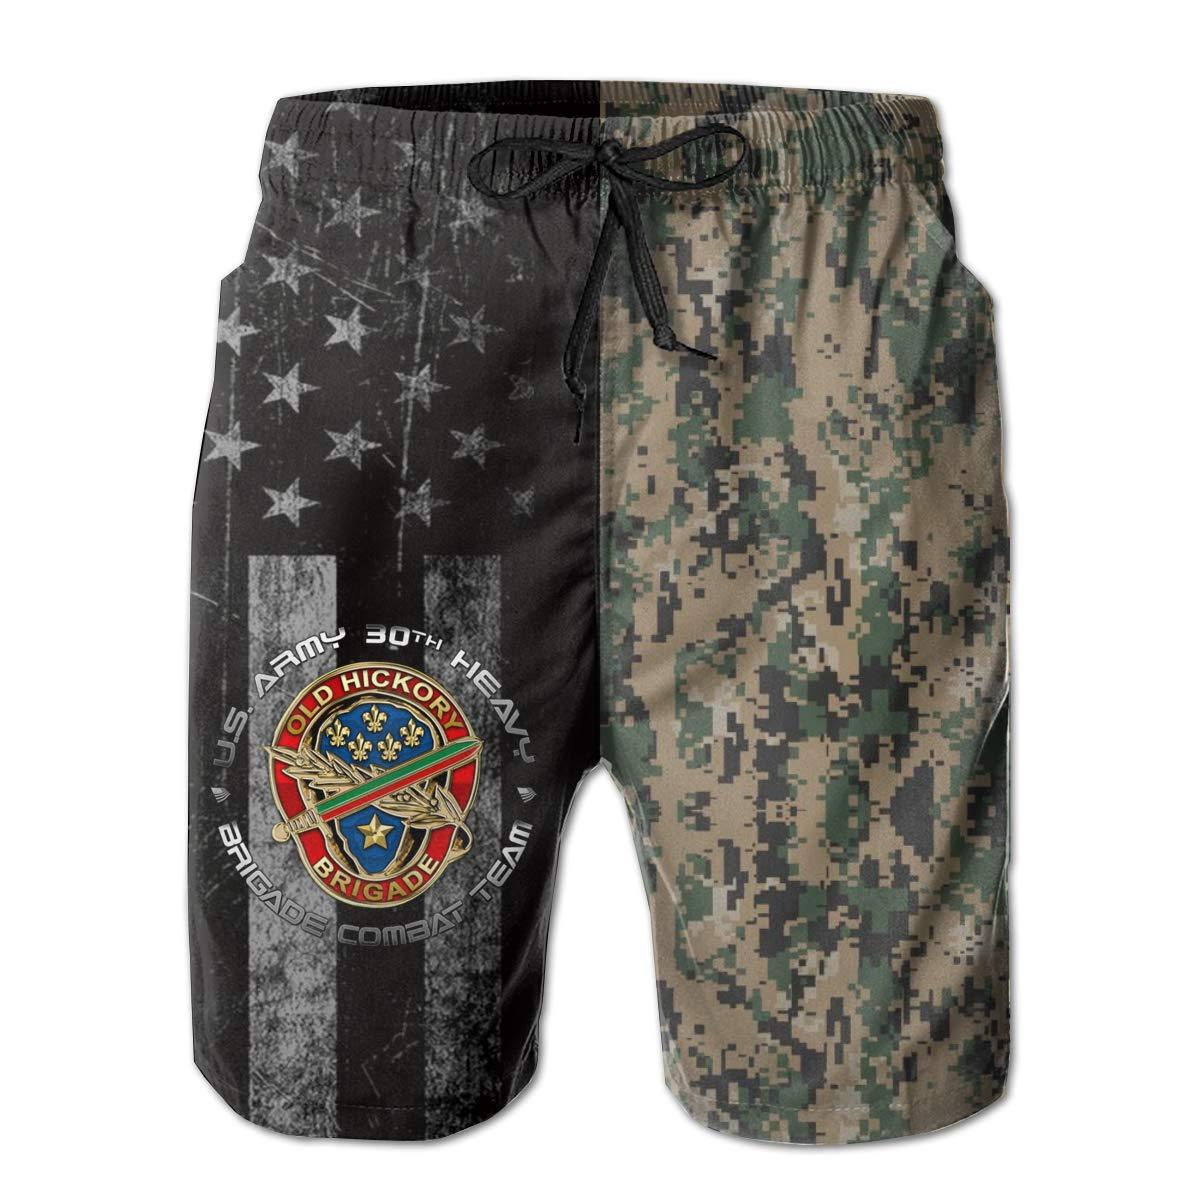 30th Infantry Brigade DUI Mens Swim Trunks Beach Short Board Shorts